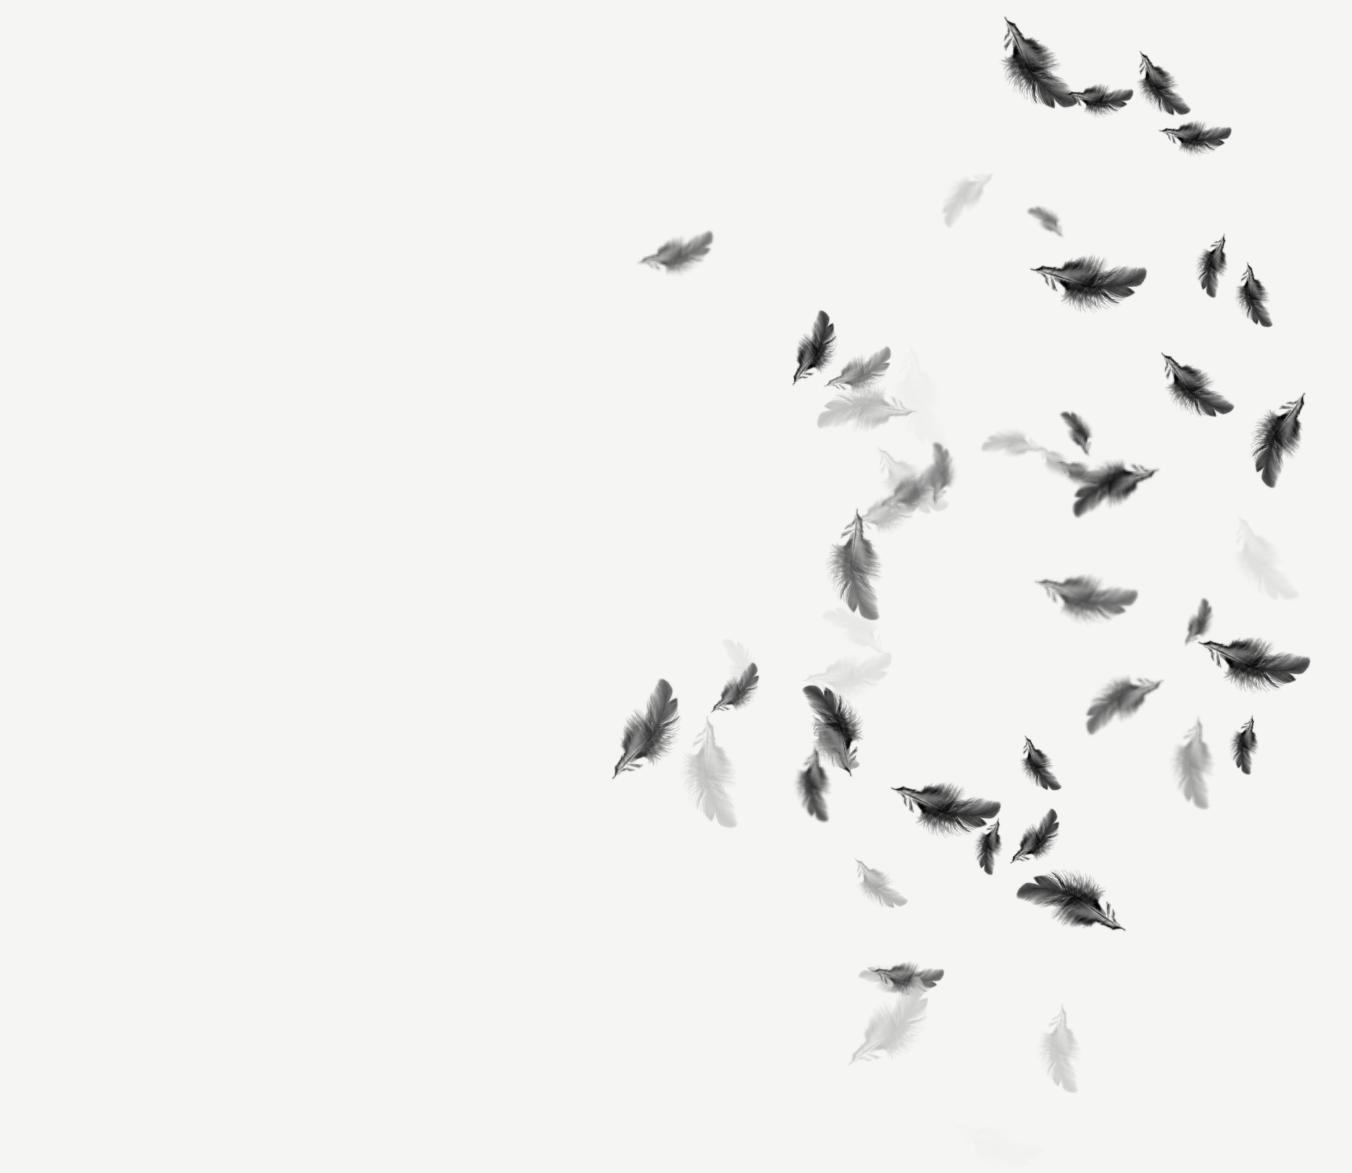 Download 98 Background Black White Tumblr HD Terbaru